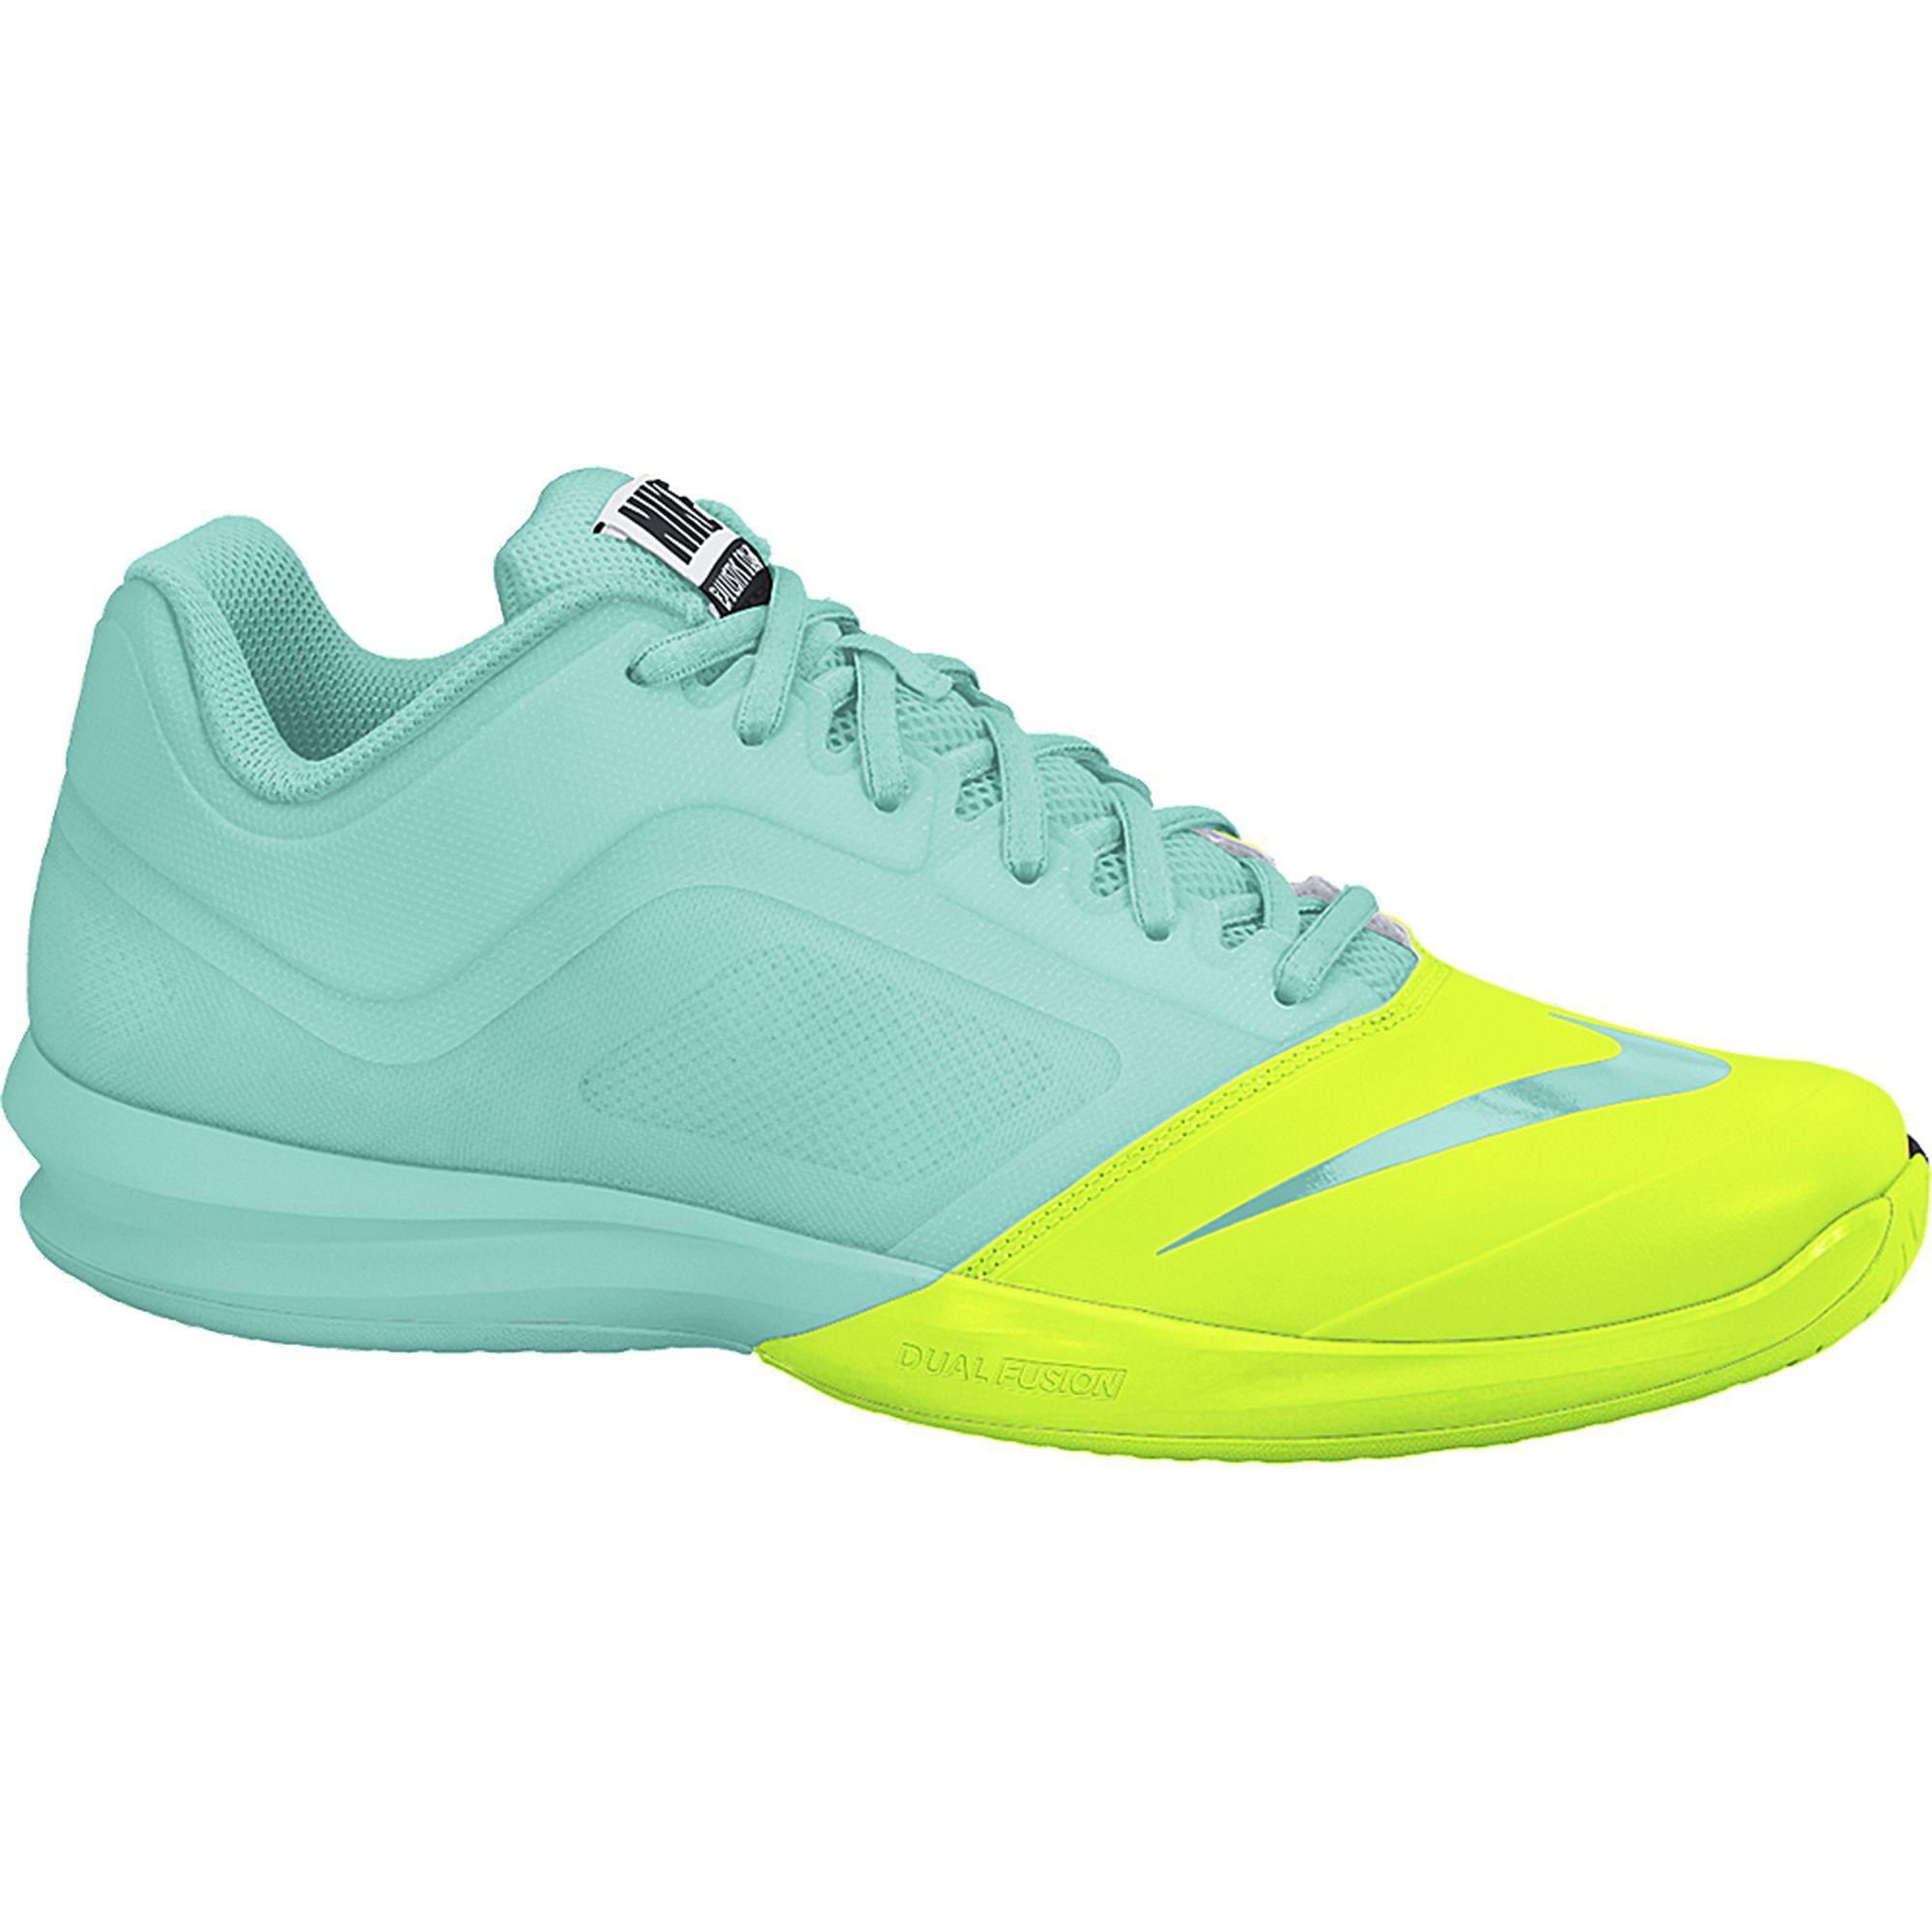 superior quality f6497 b69d4 Nike Womens Dual Fusion Ballistec Advantage Tennis Shoes - Bleached  Turquoise Volt - Tennisnuts.com